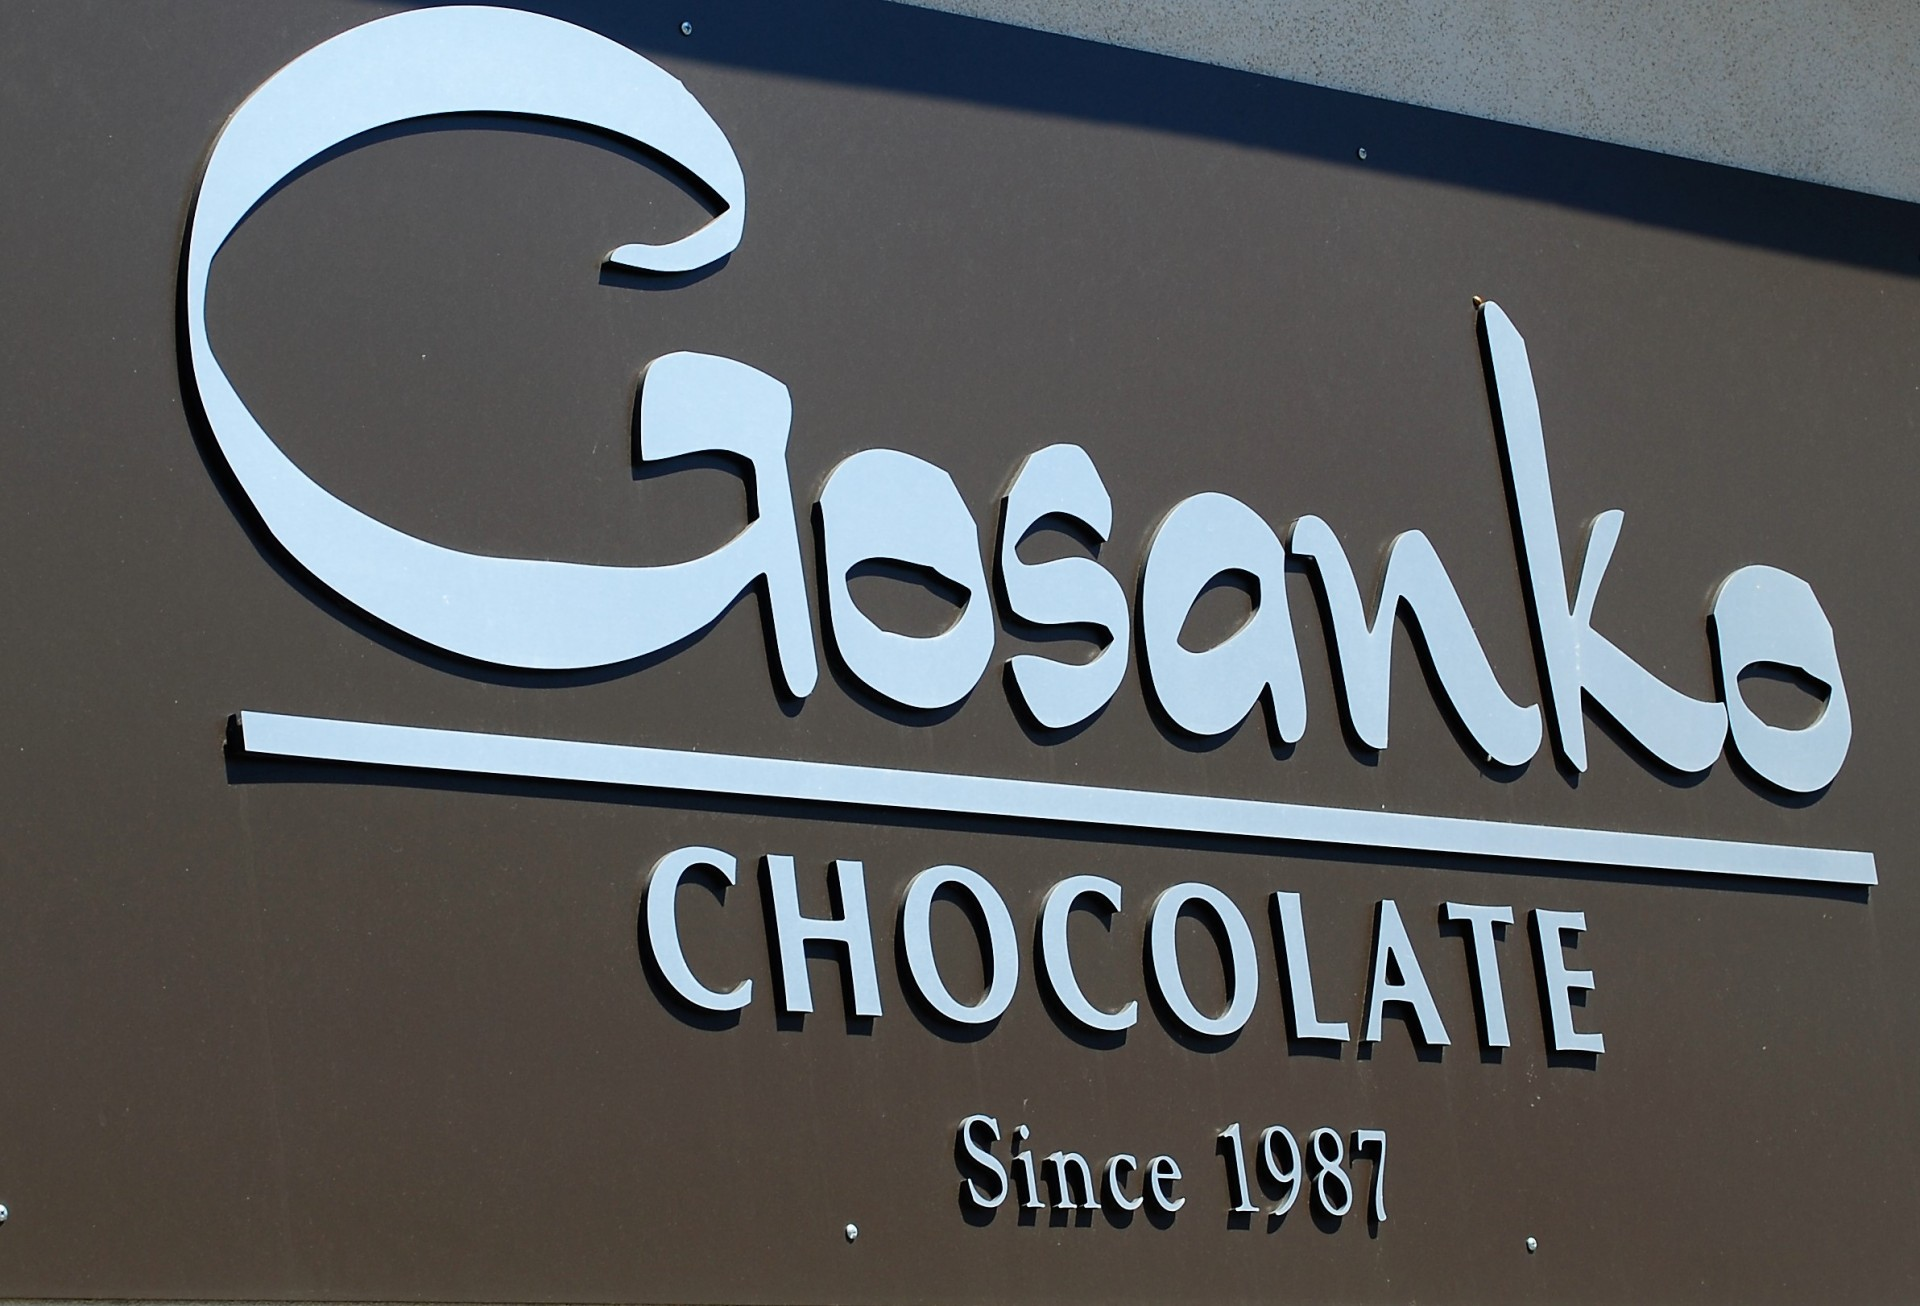 Gosanko Chocolates - A St. 2